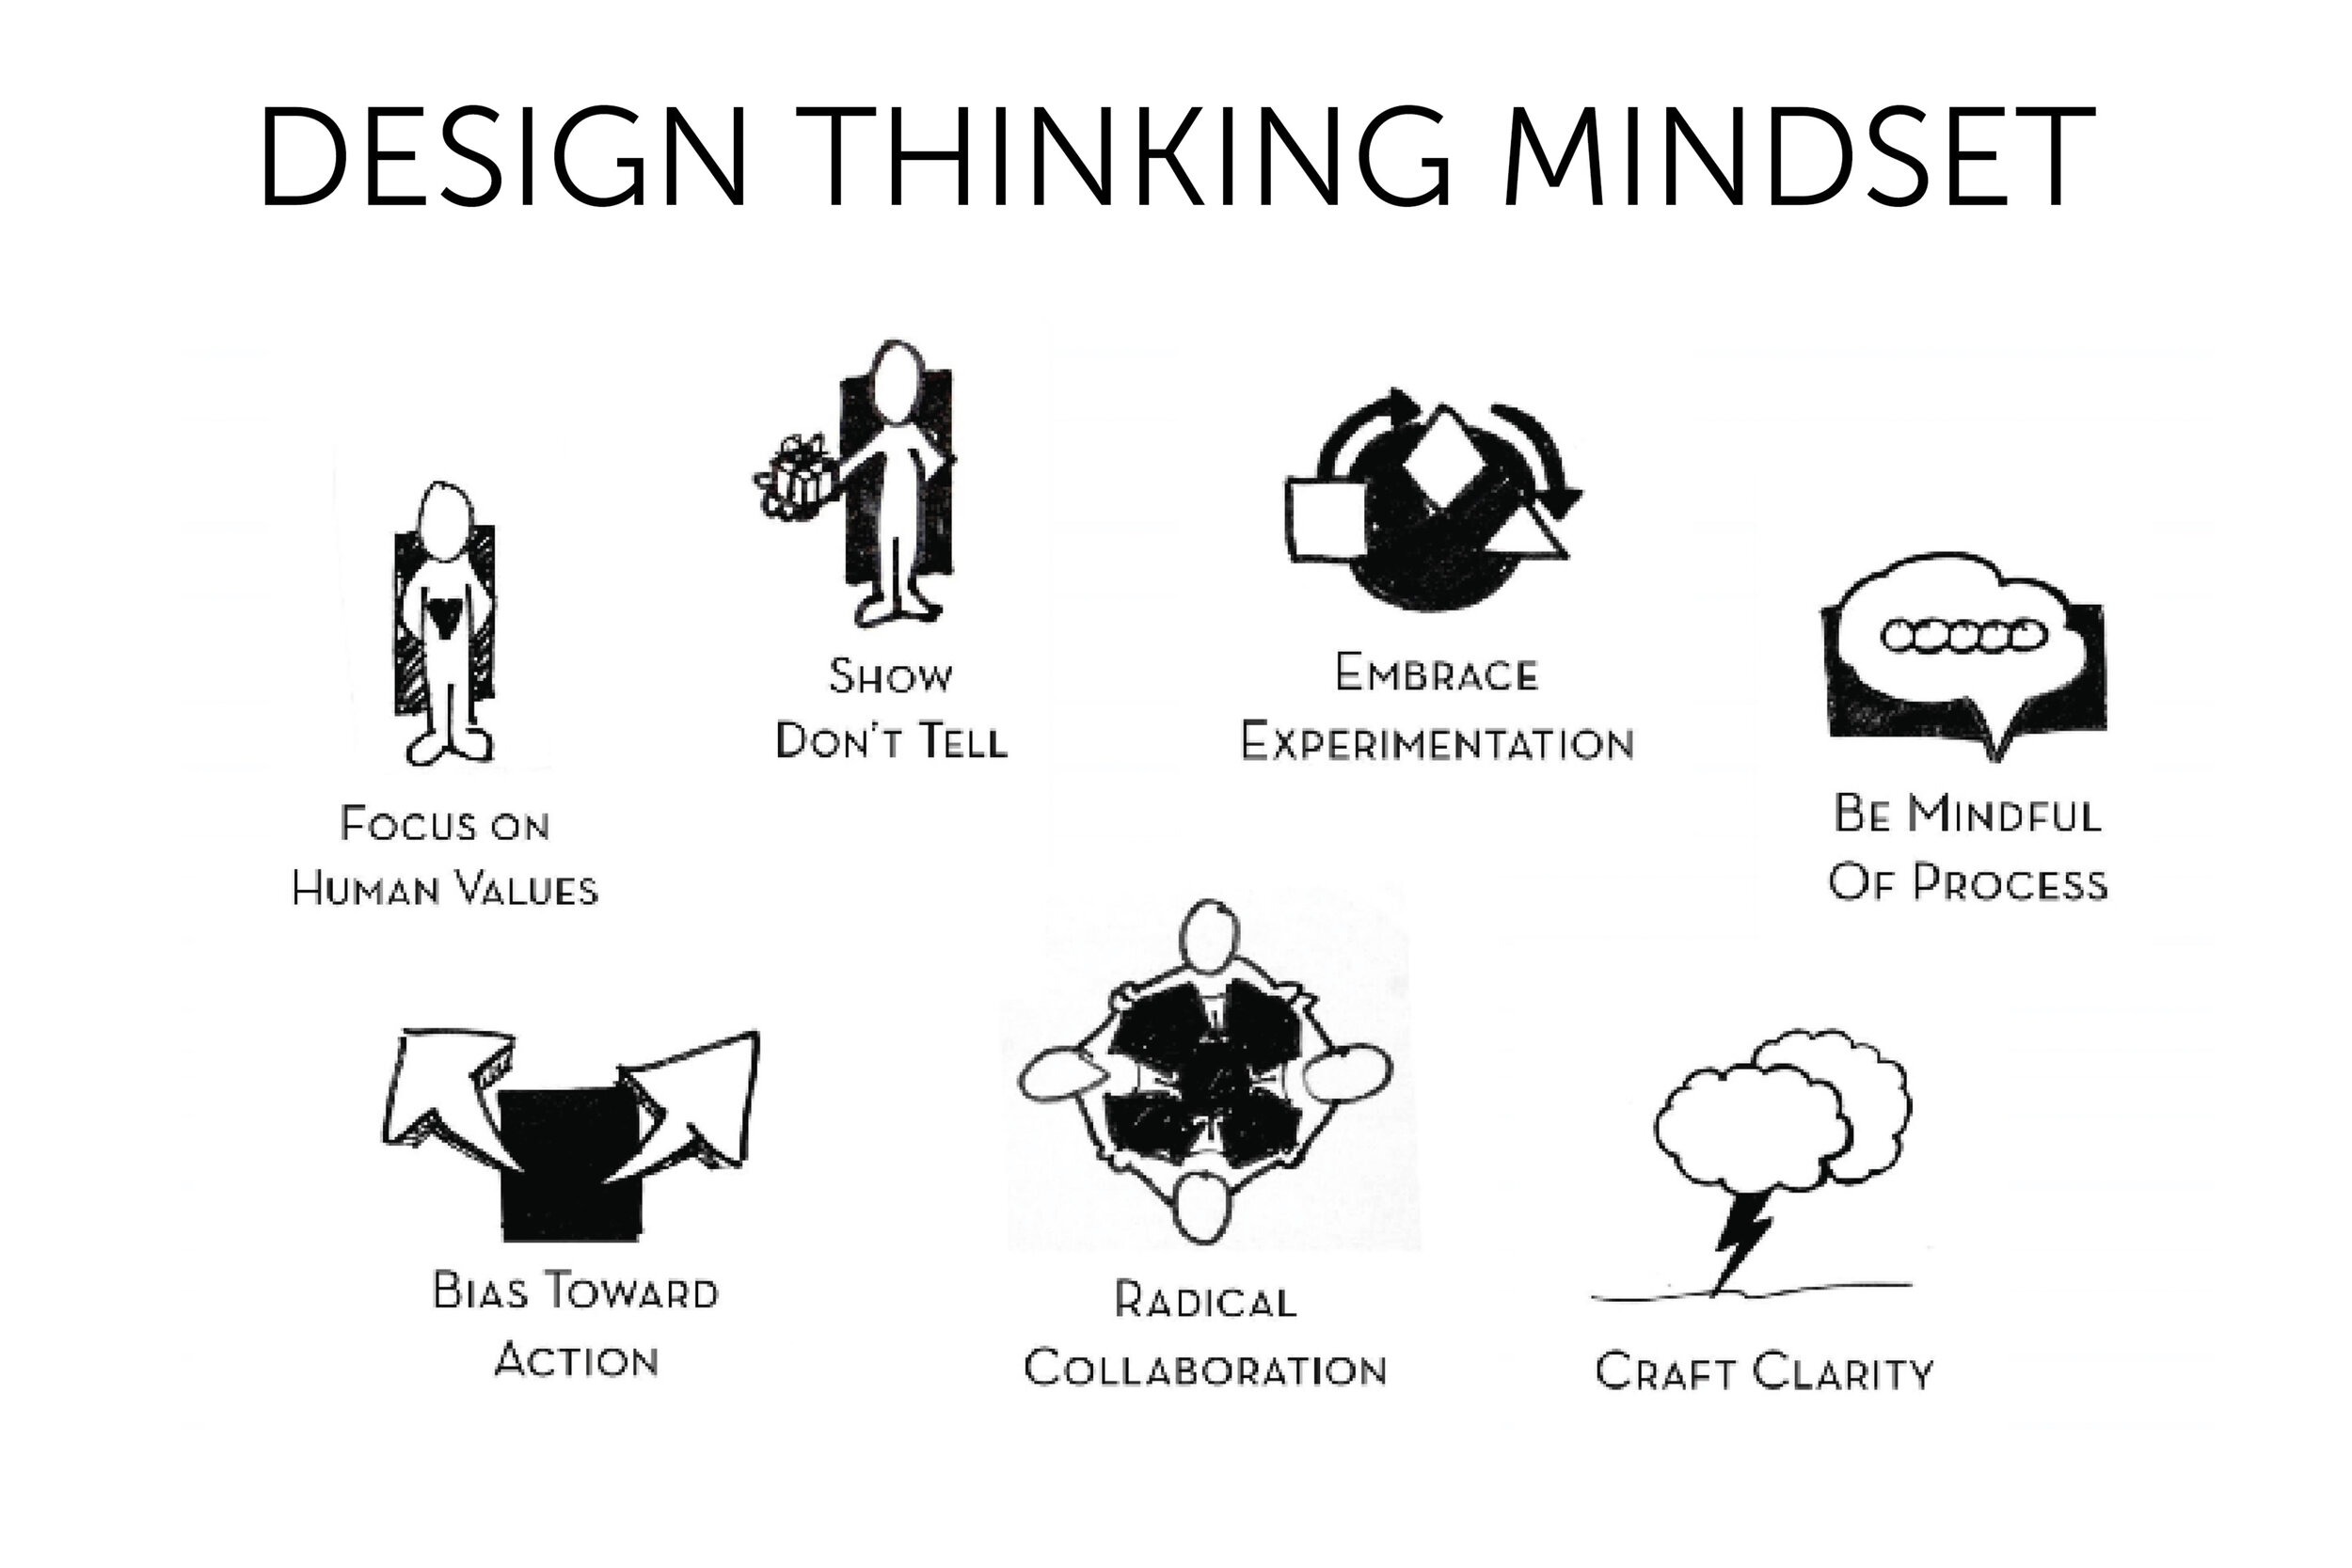 Design thinking mindsets.jpg